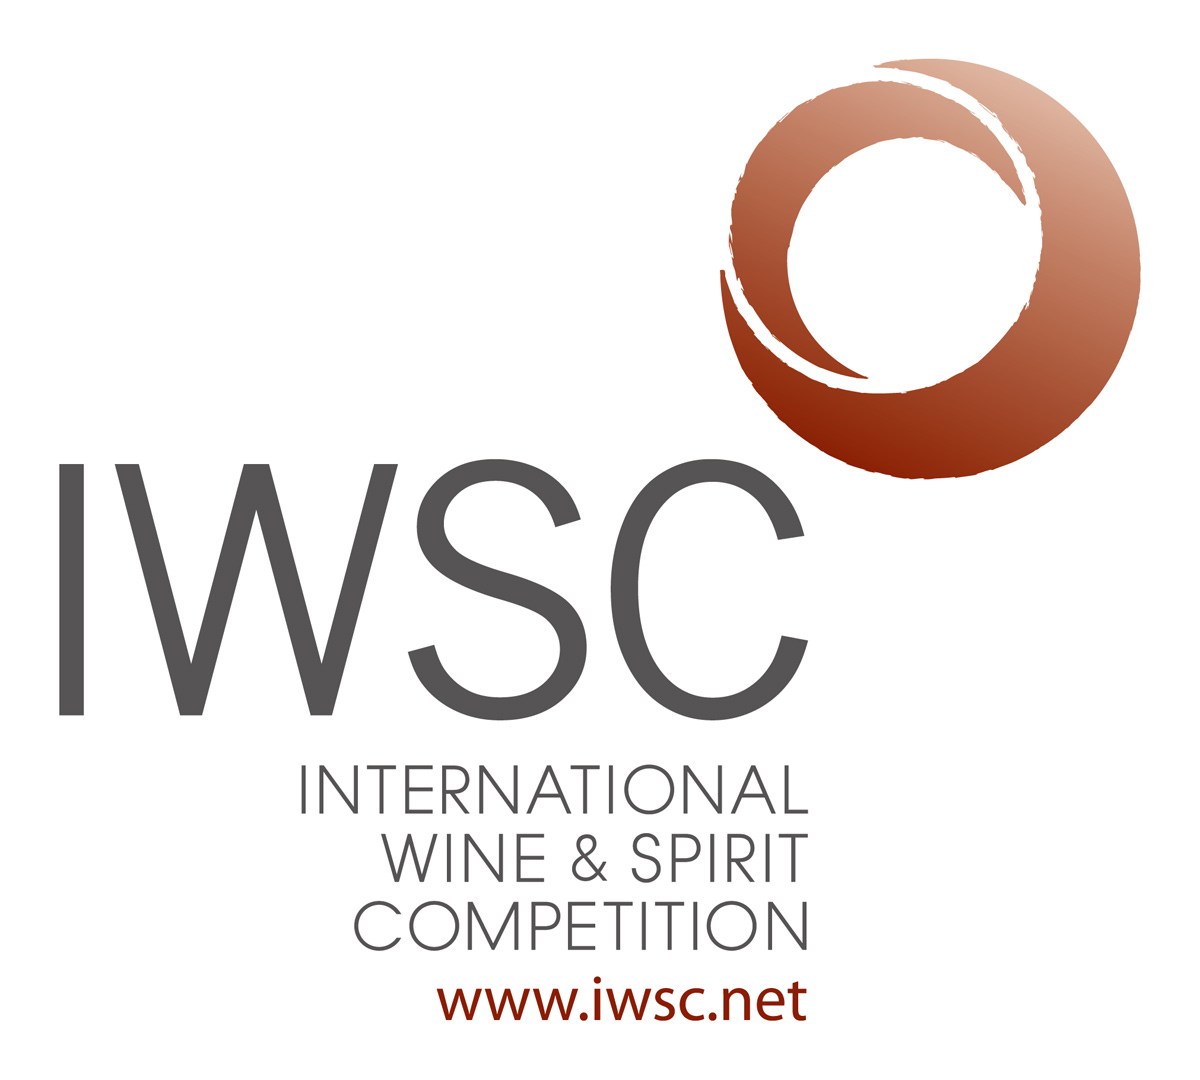 Фото: логотип конкурса IWSC (International Wine and Spirits Competition)